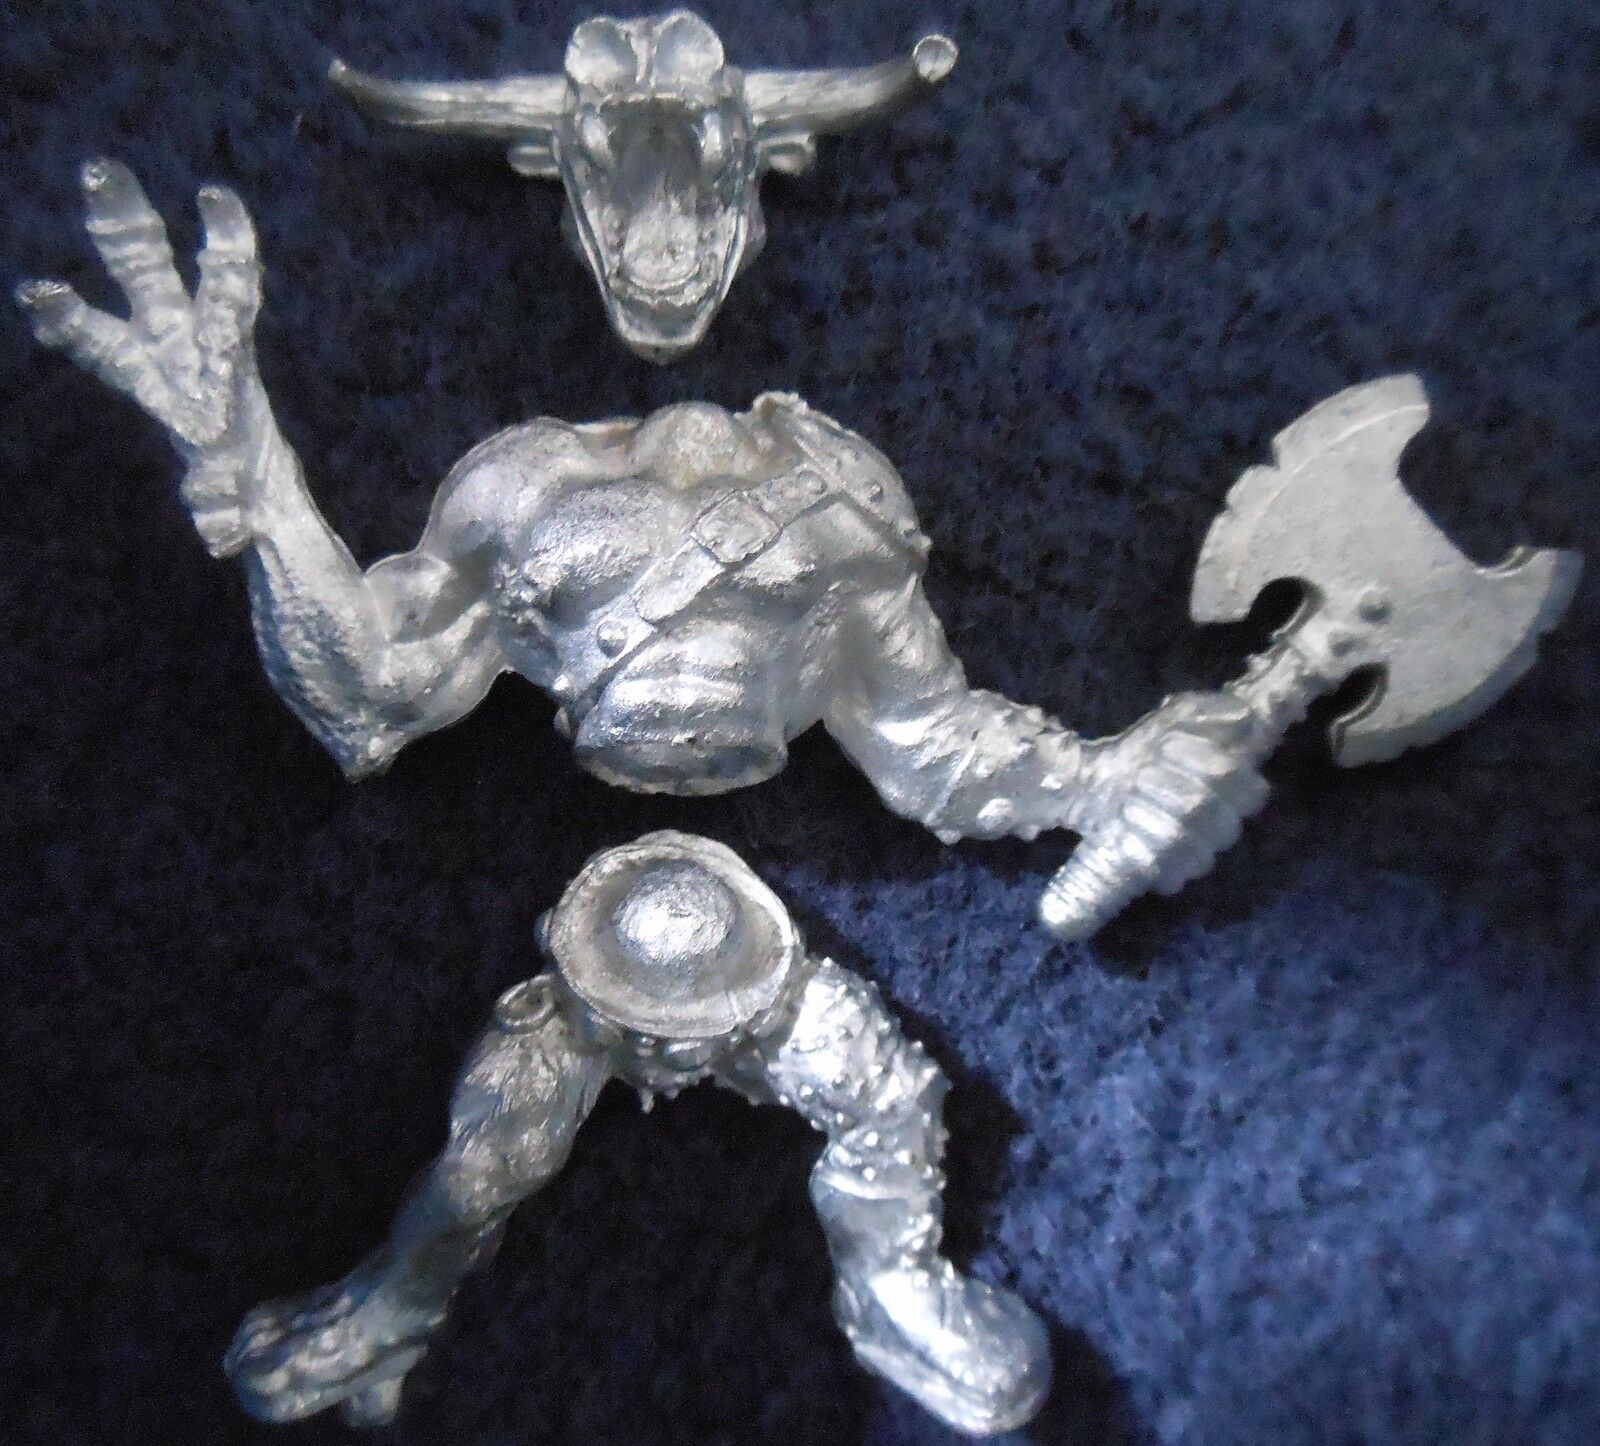 1987 Chaos Minotaur Lord C34 Sir Loin Foul Breath 4 Citadel Beasts Beastmen Army